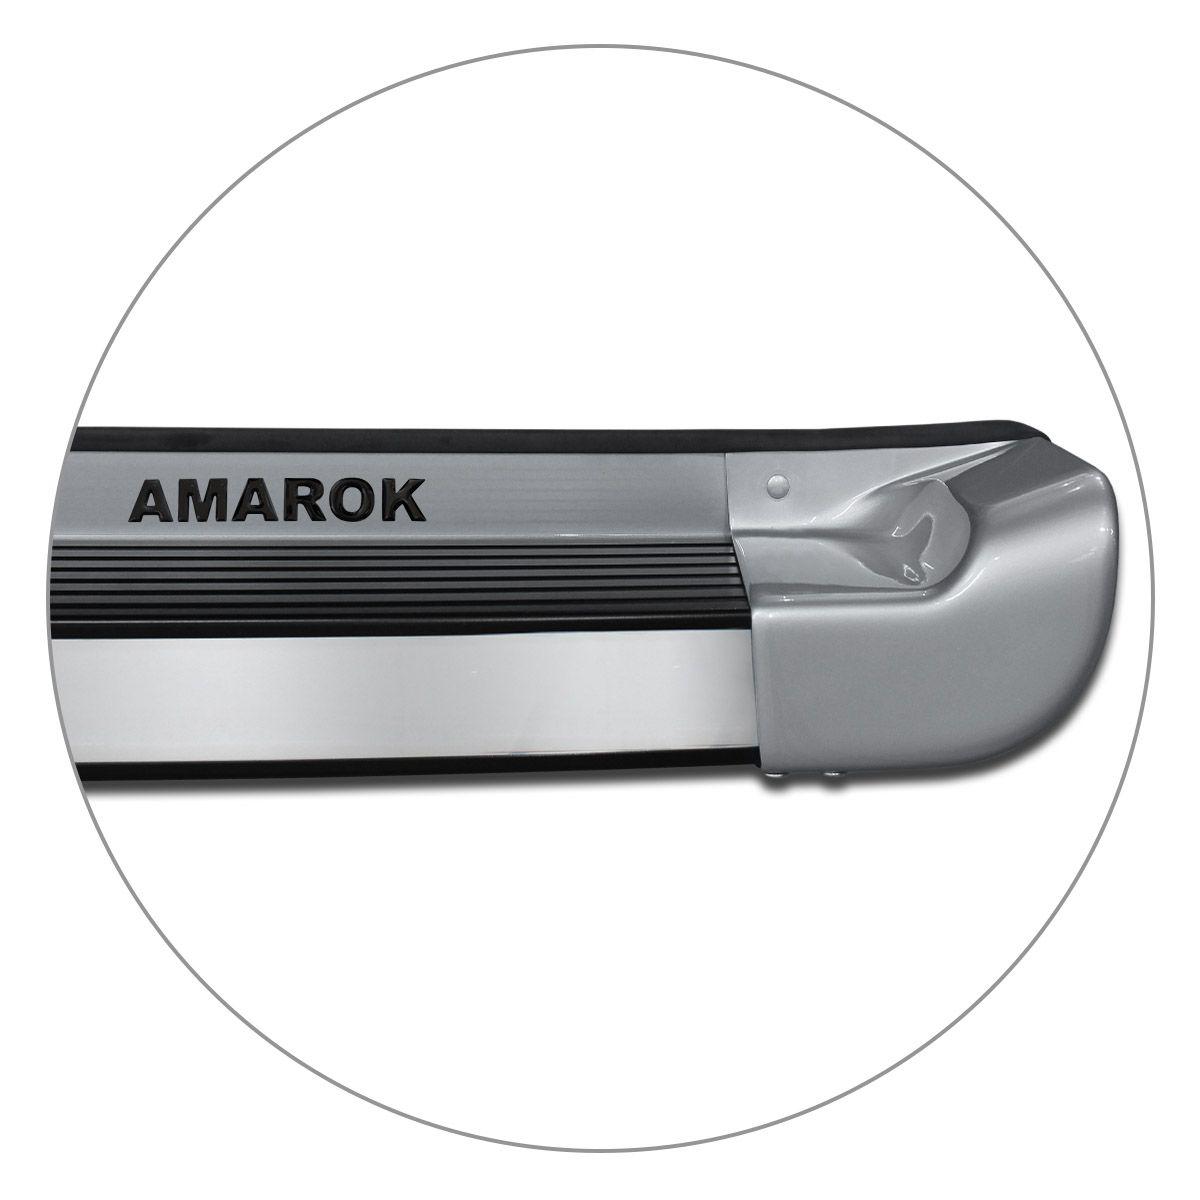 Estribo Lateral Amarok CD 2010 a 2019 Prata Sargas Personalizado